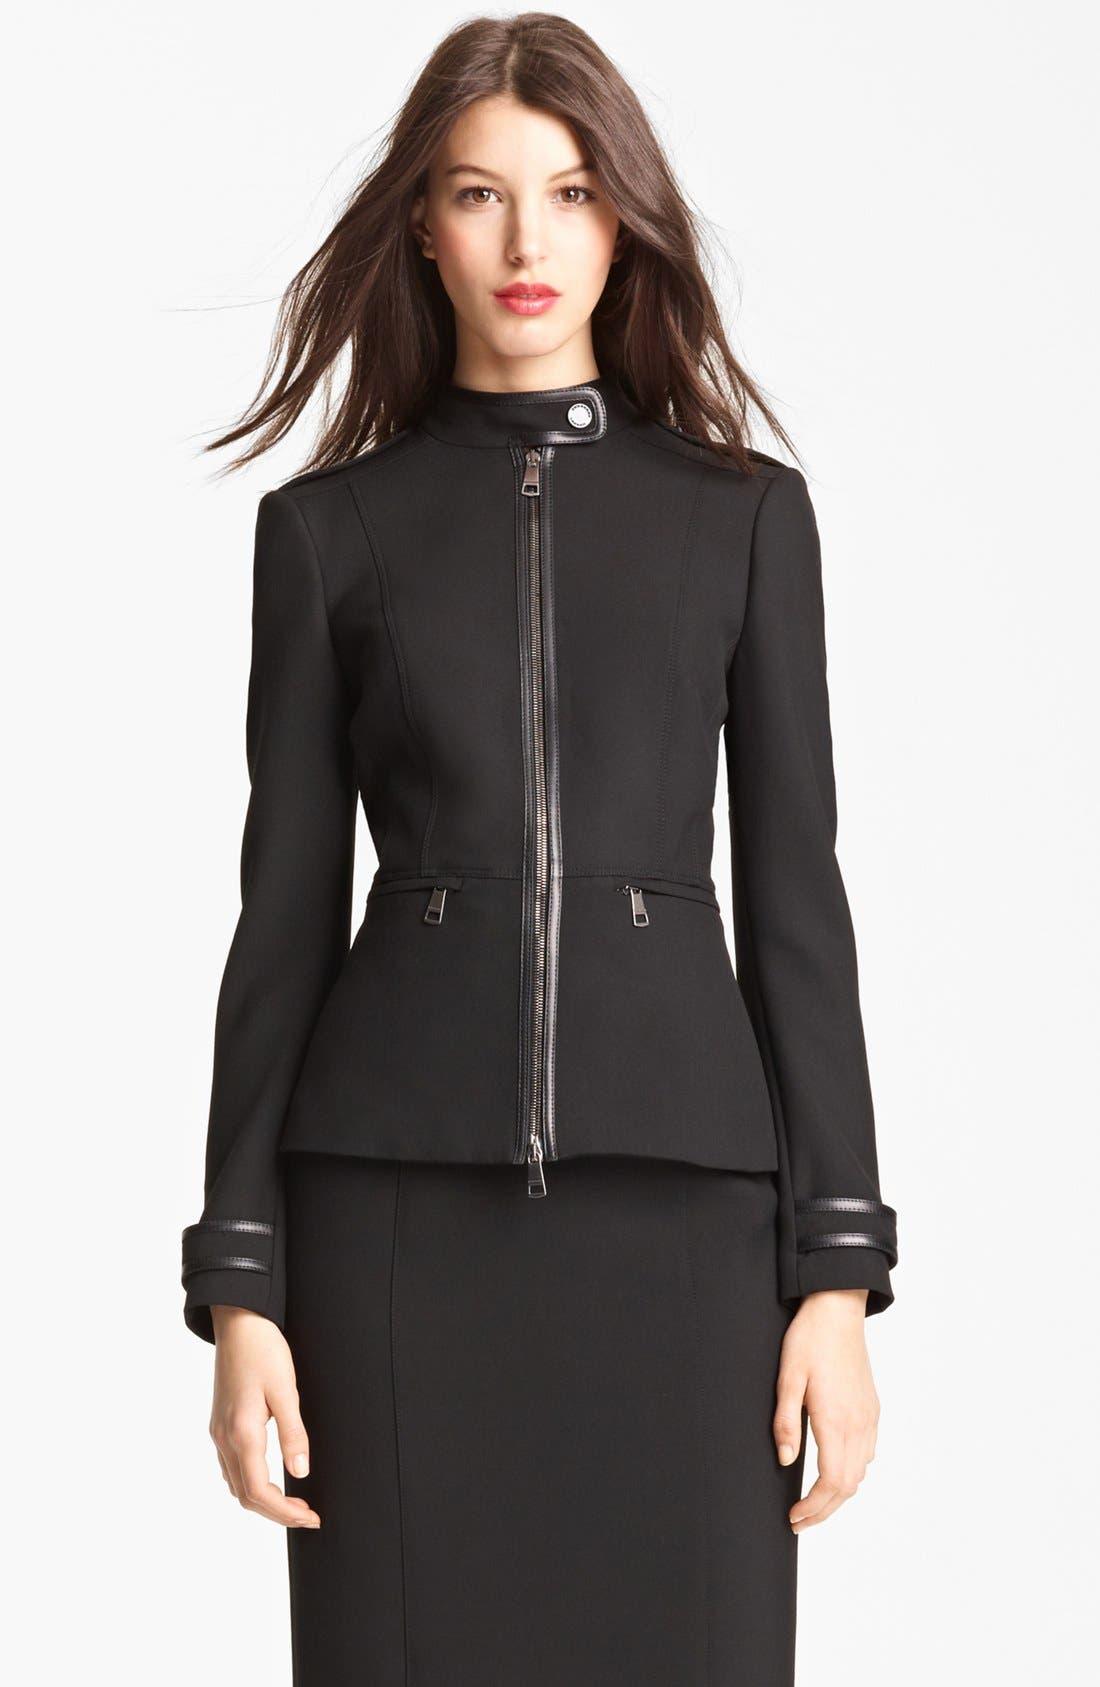 Main Image - Burberry London Leather Trim Stretch Jersey Jacket